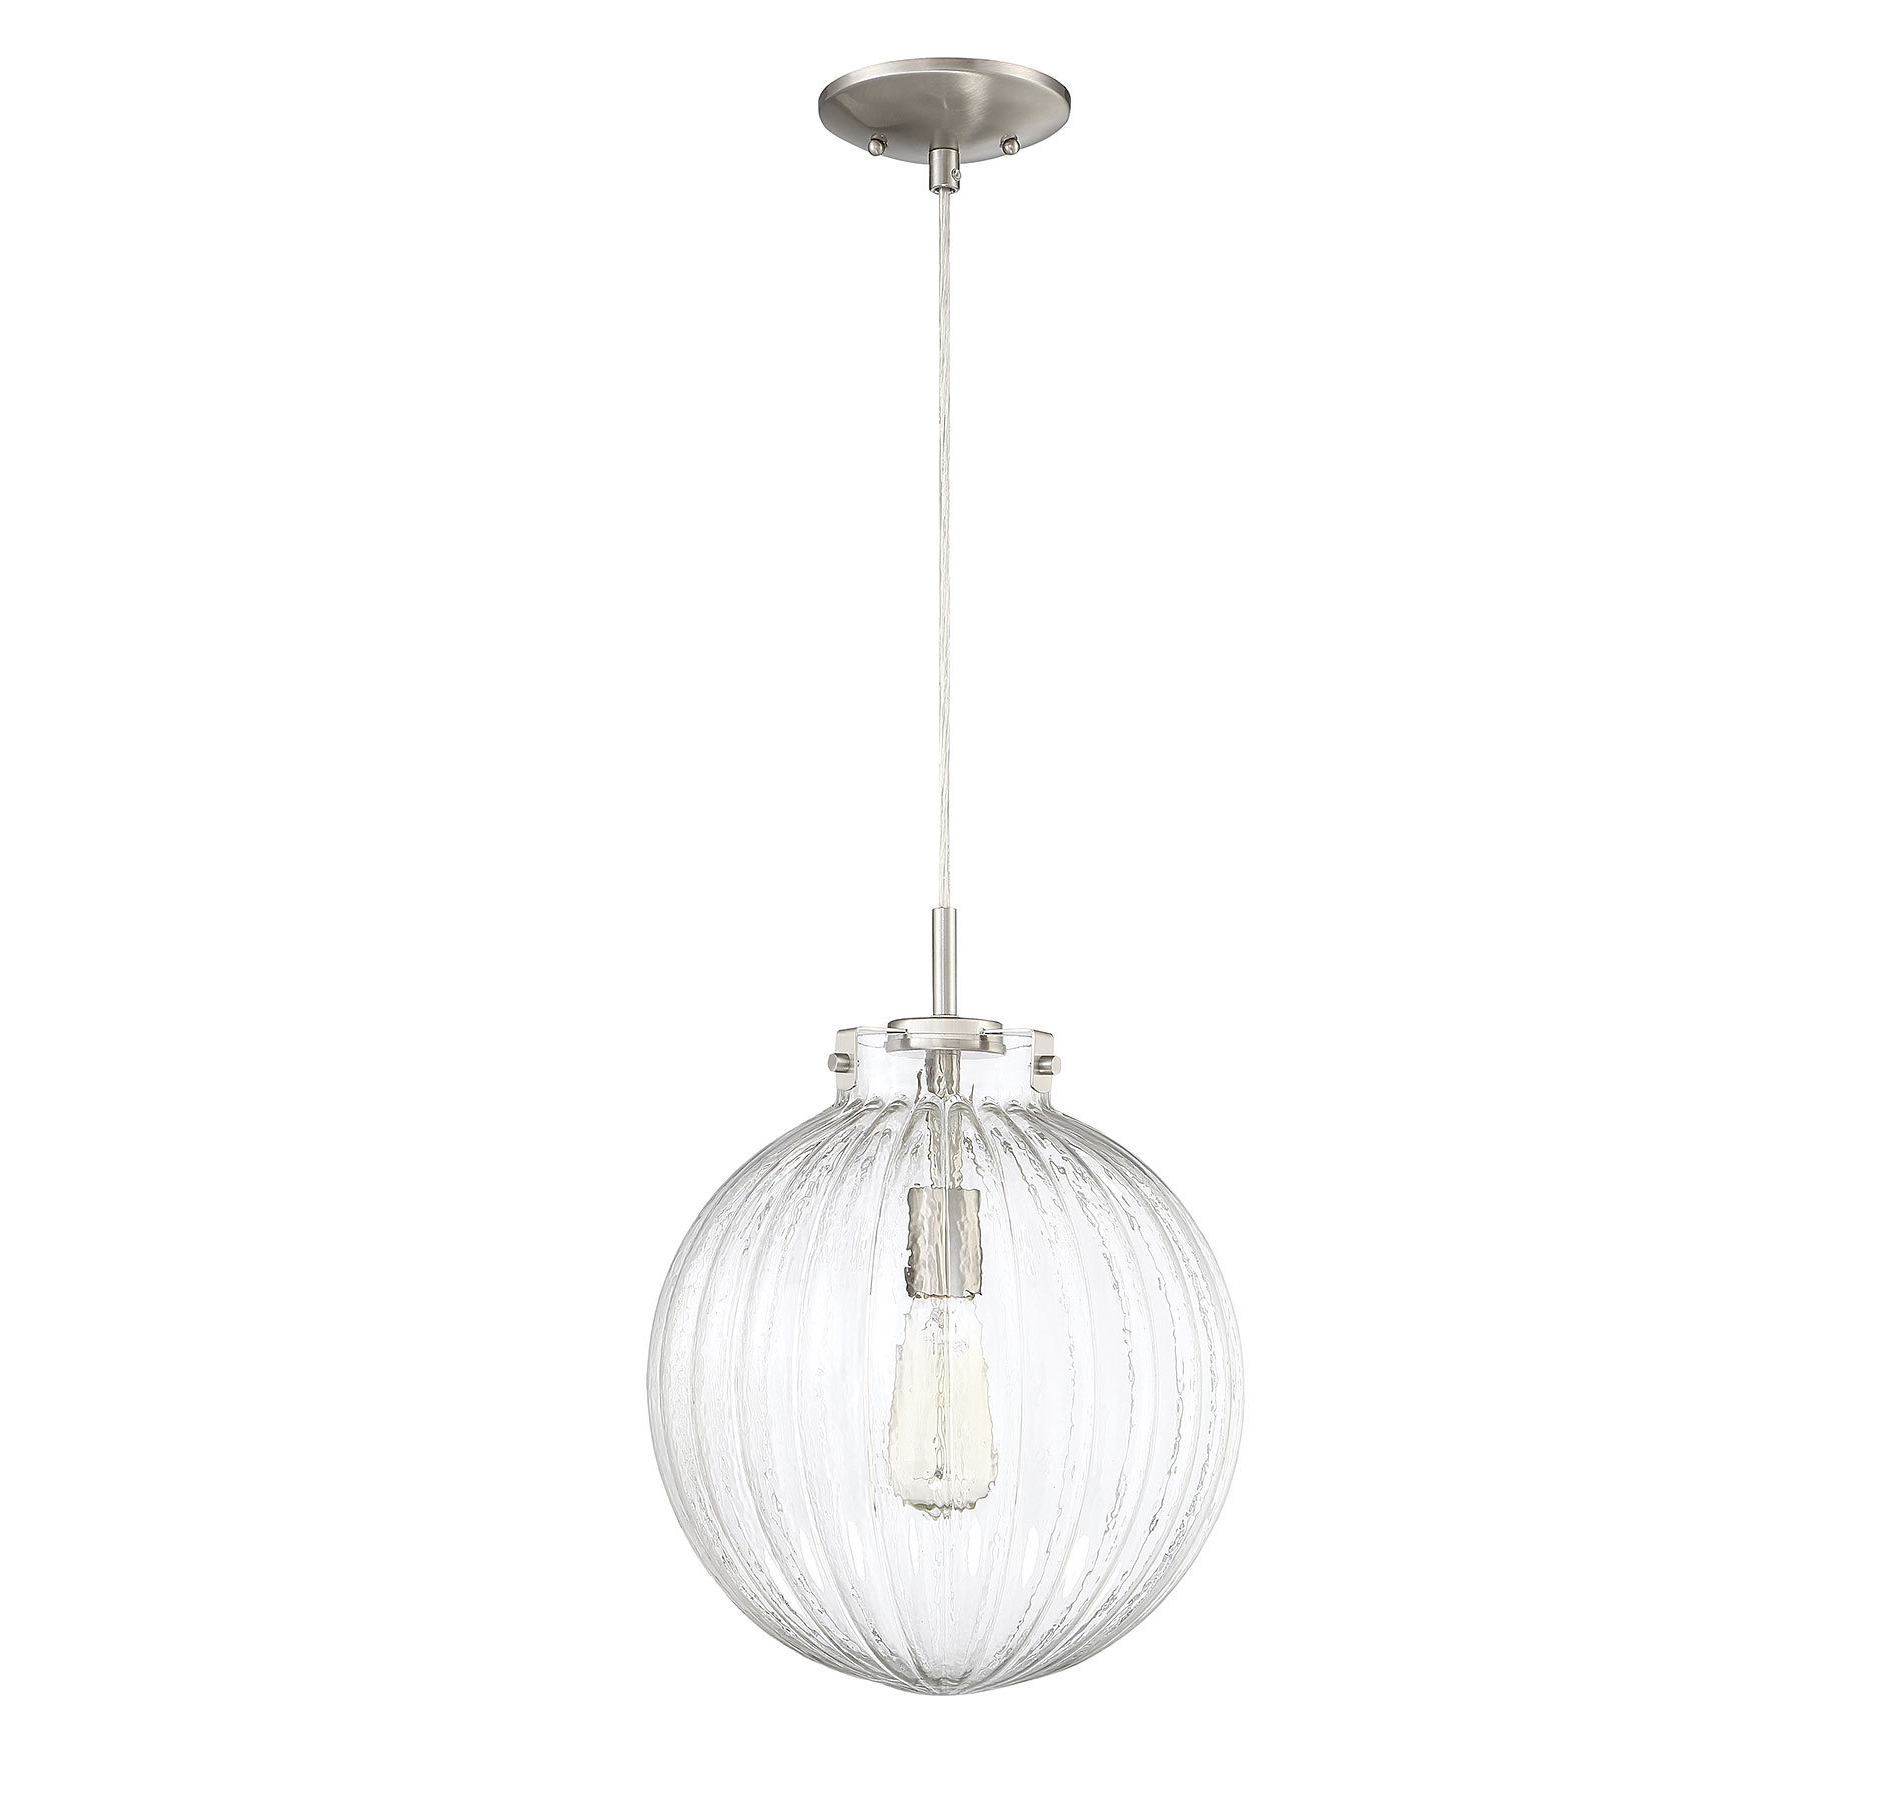 Nevels 1 Light Single Globe Pendant Regarding Fashionable 1 Light Geometric Globe Pendants (View 19 of 25)